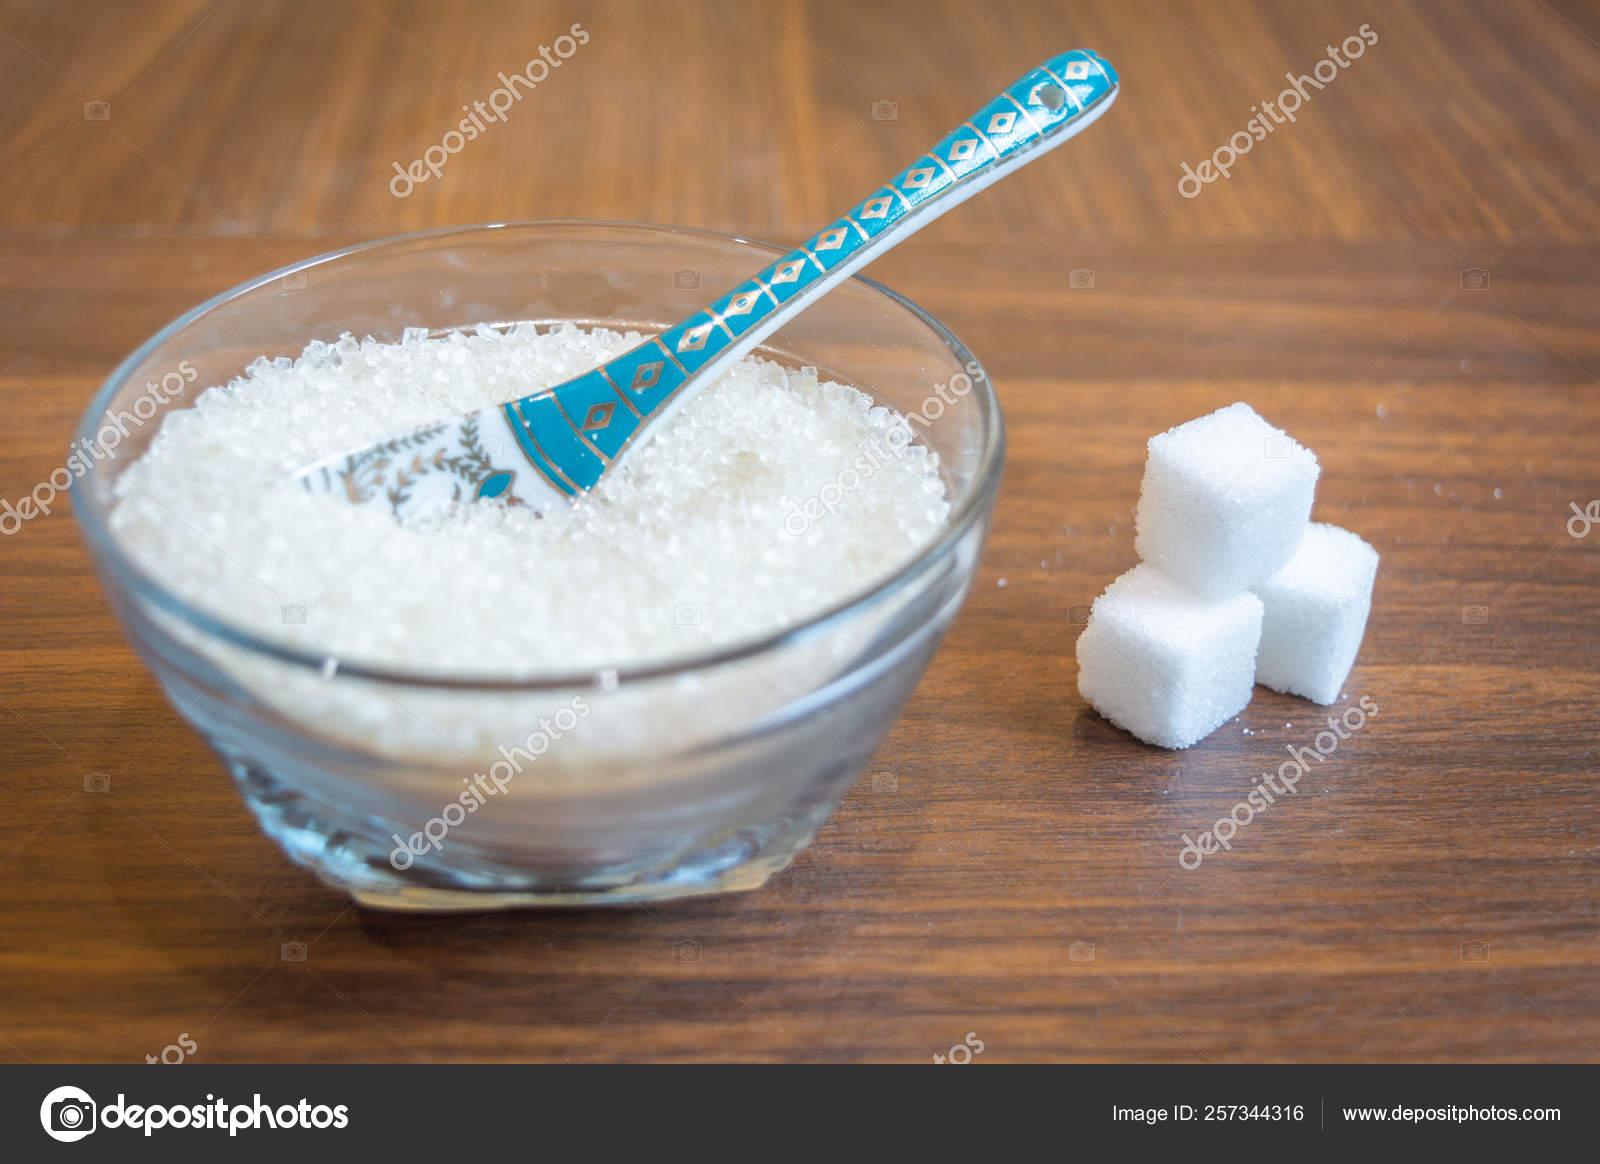 White Sugar Kept Glass Bowl Spoon Some Sugar Cubes Kept